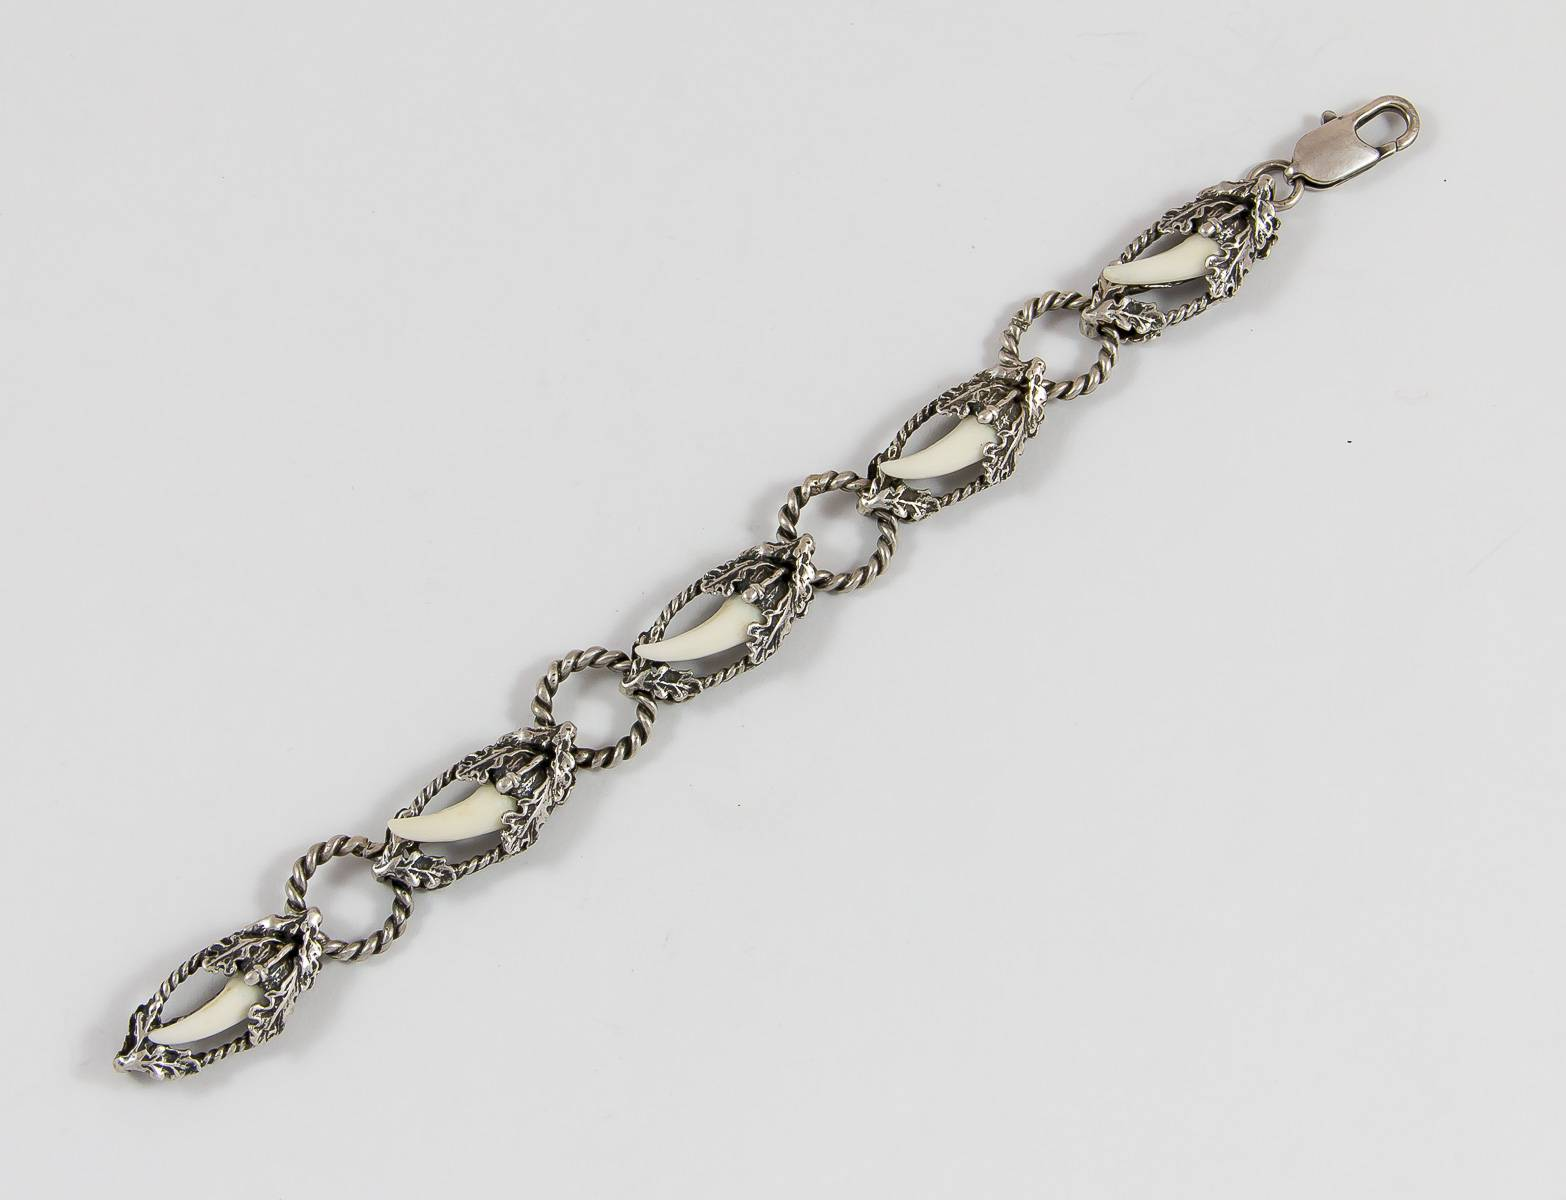 Armband mit 4 Fuchszähnen